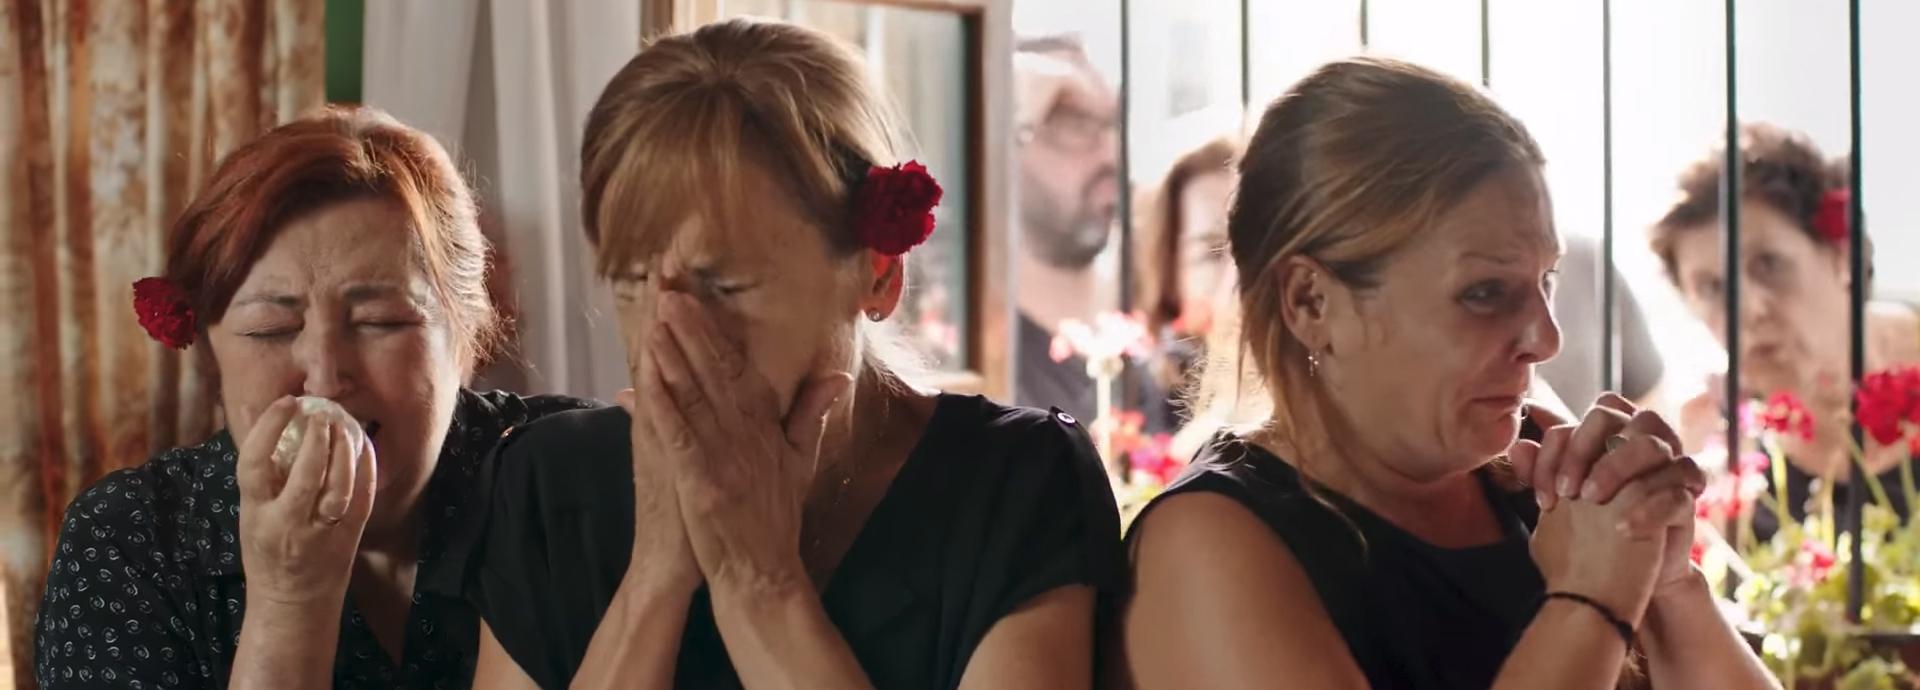 ¡Ay, Mi Madre!. Image Credit: Gossip Event & Productions.